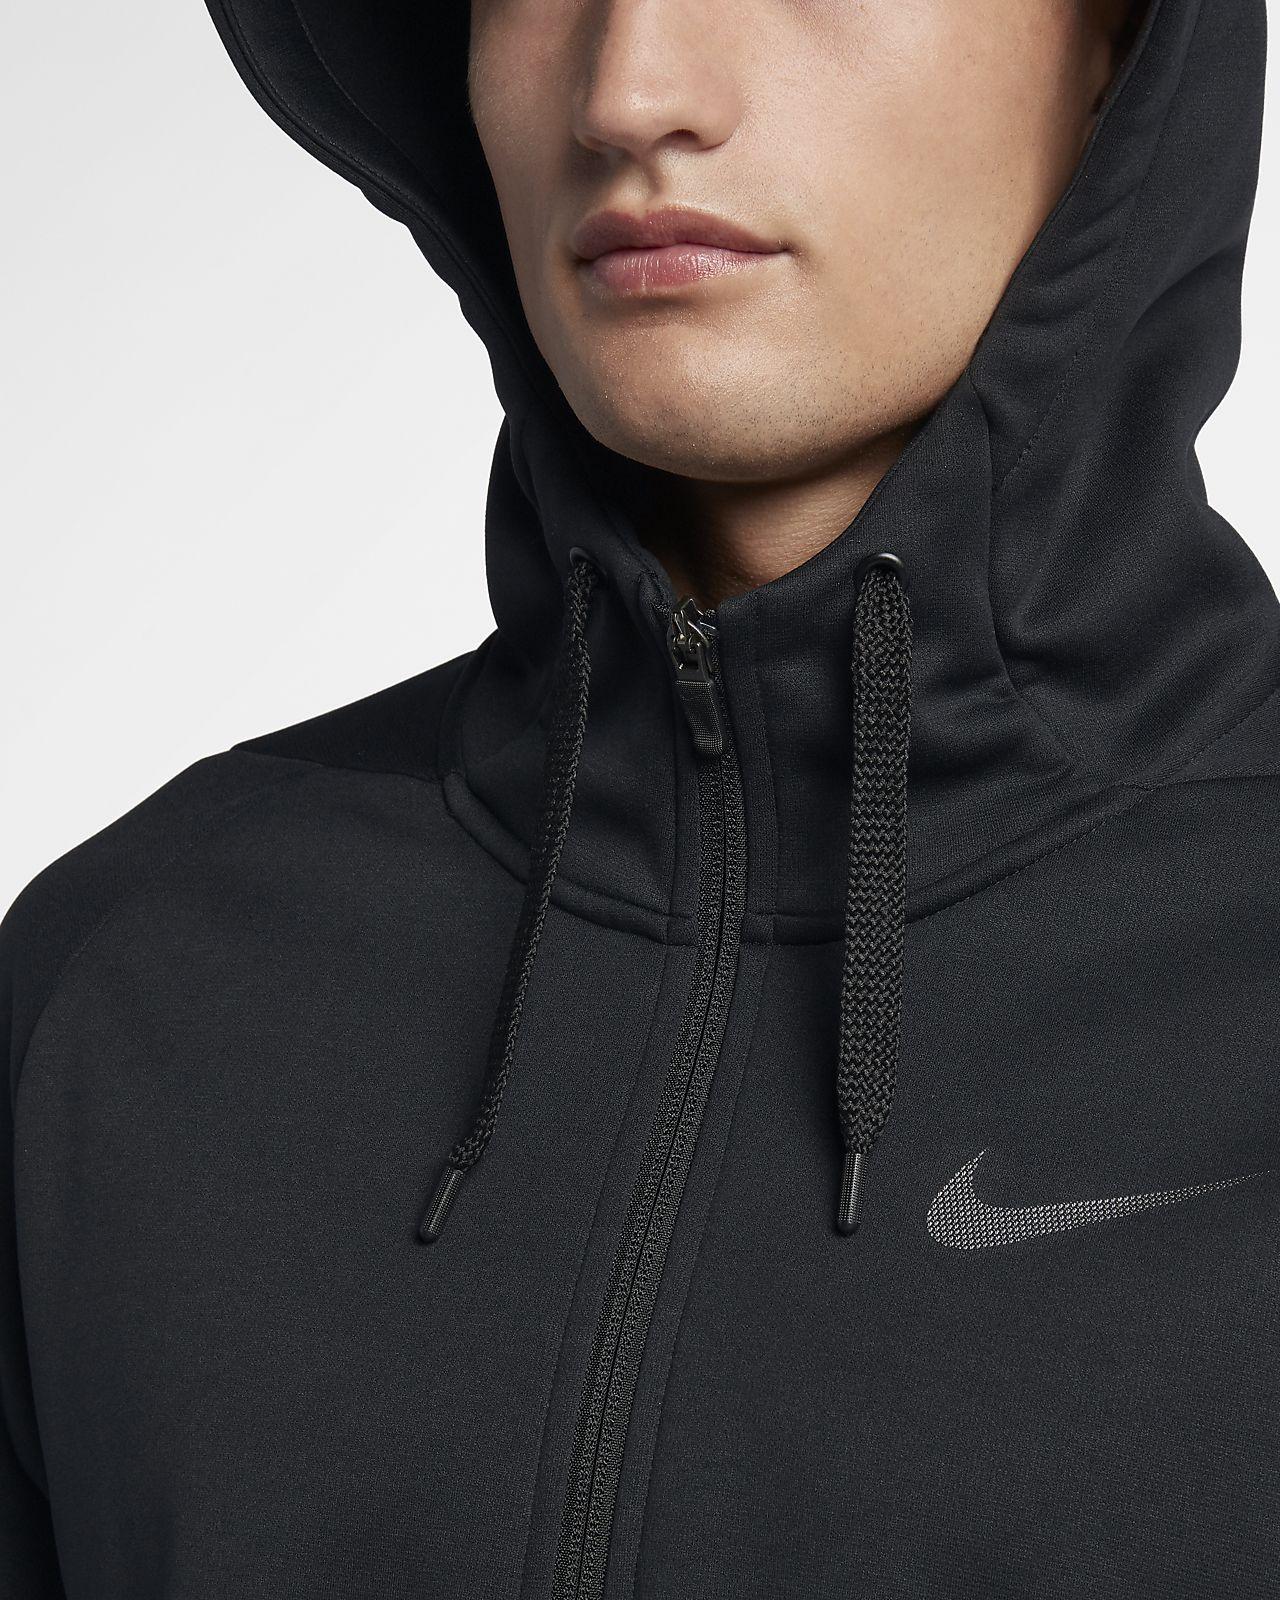 Giacca Tuta Nike Warm Up Inverno Donna Tennis Warehouse Europe